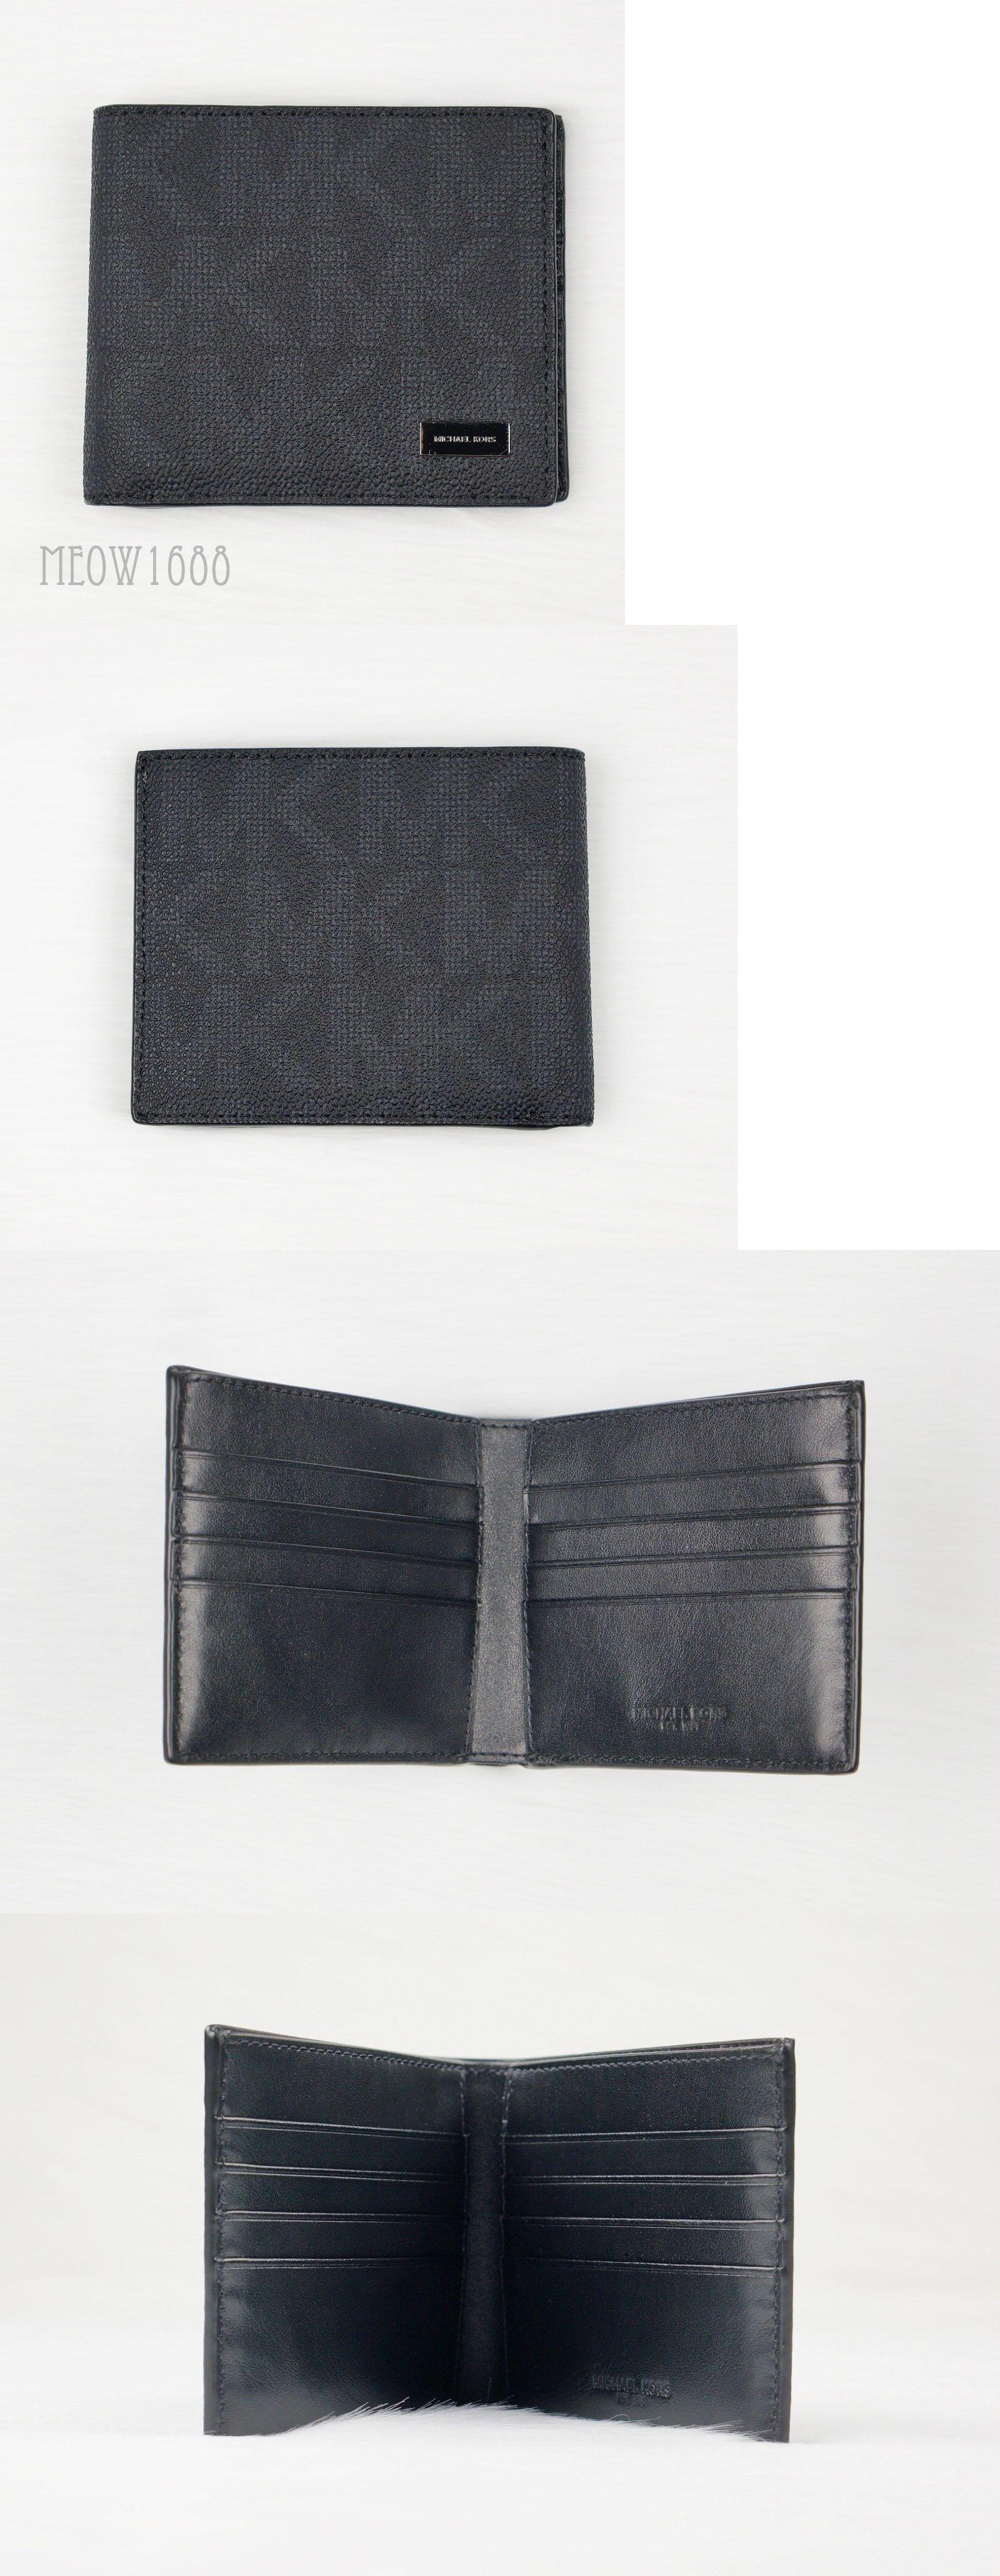 1757dd3f50cdd7 Wallets 2996: New Authentic Michael Kors Men Jet Set Black Logo Bifold Billfold  Wallet $118 -> BUY IT NOW ONLY: $47.77 on eBay!